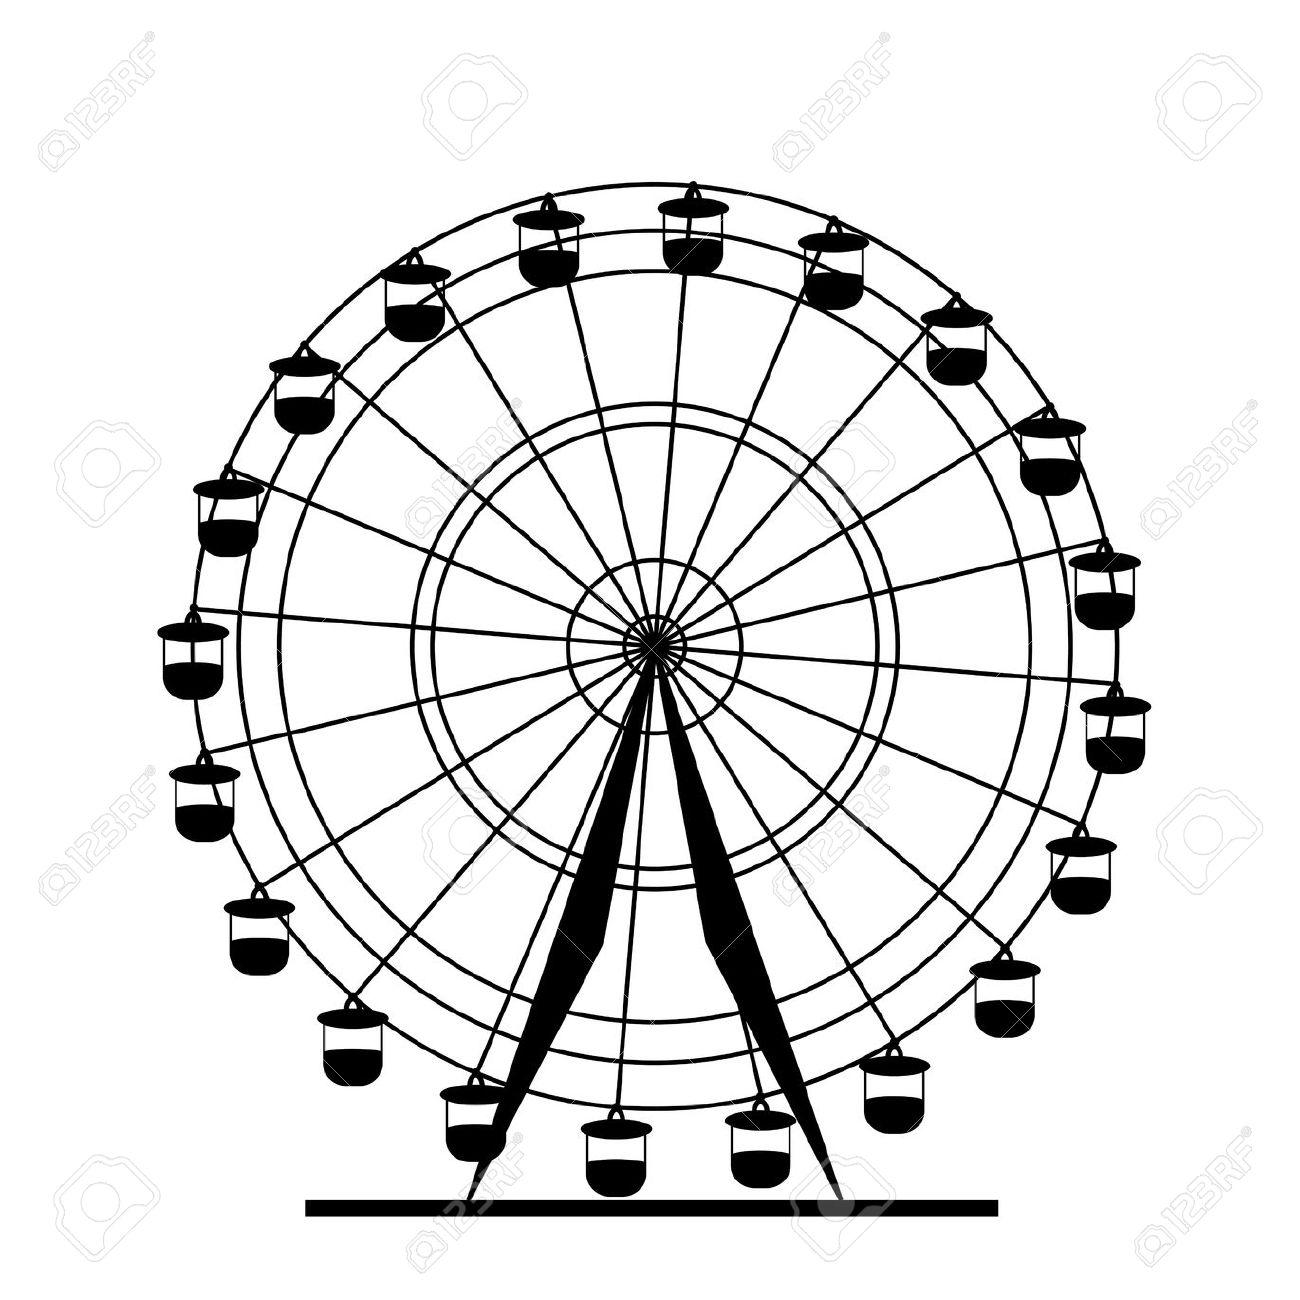 Ferris wheel clipart black and white.